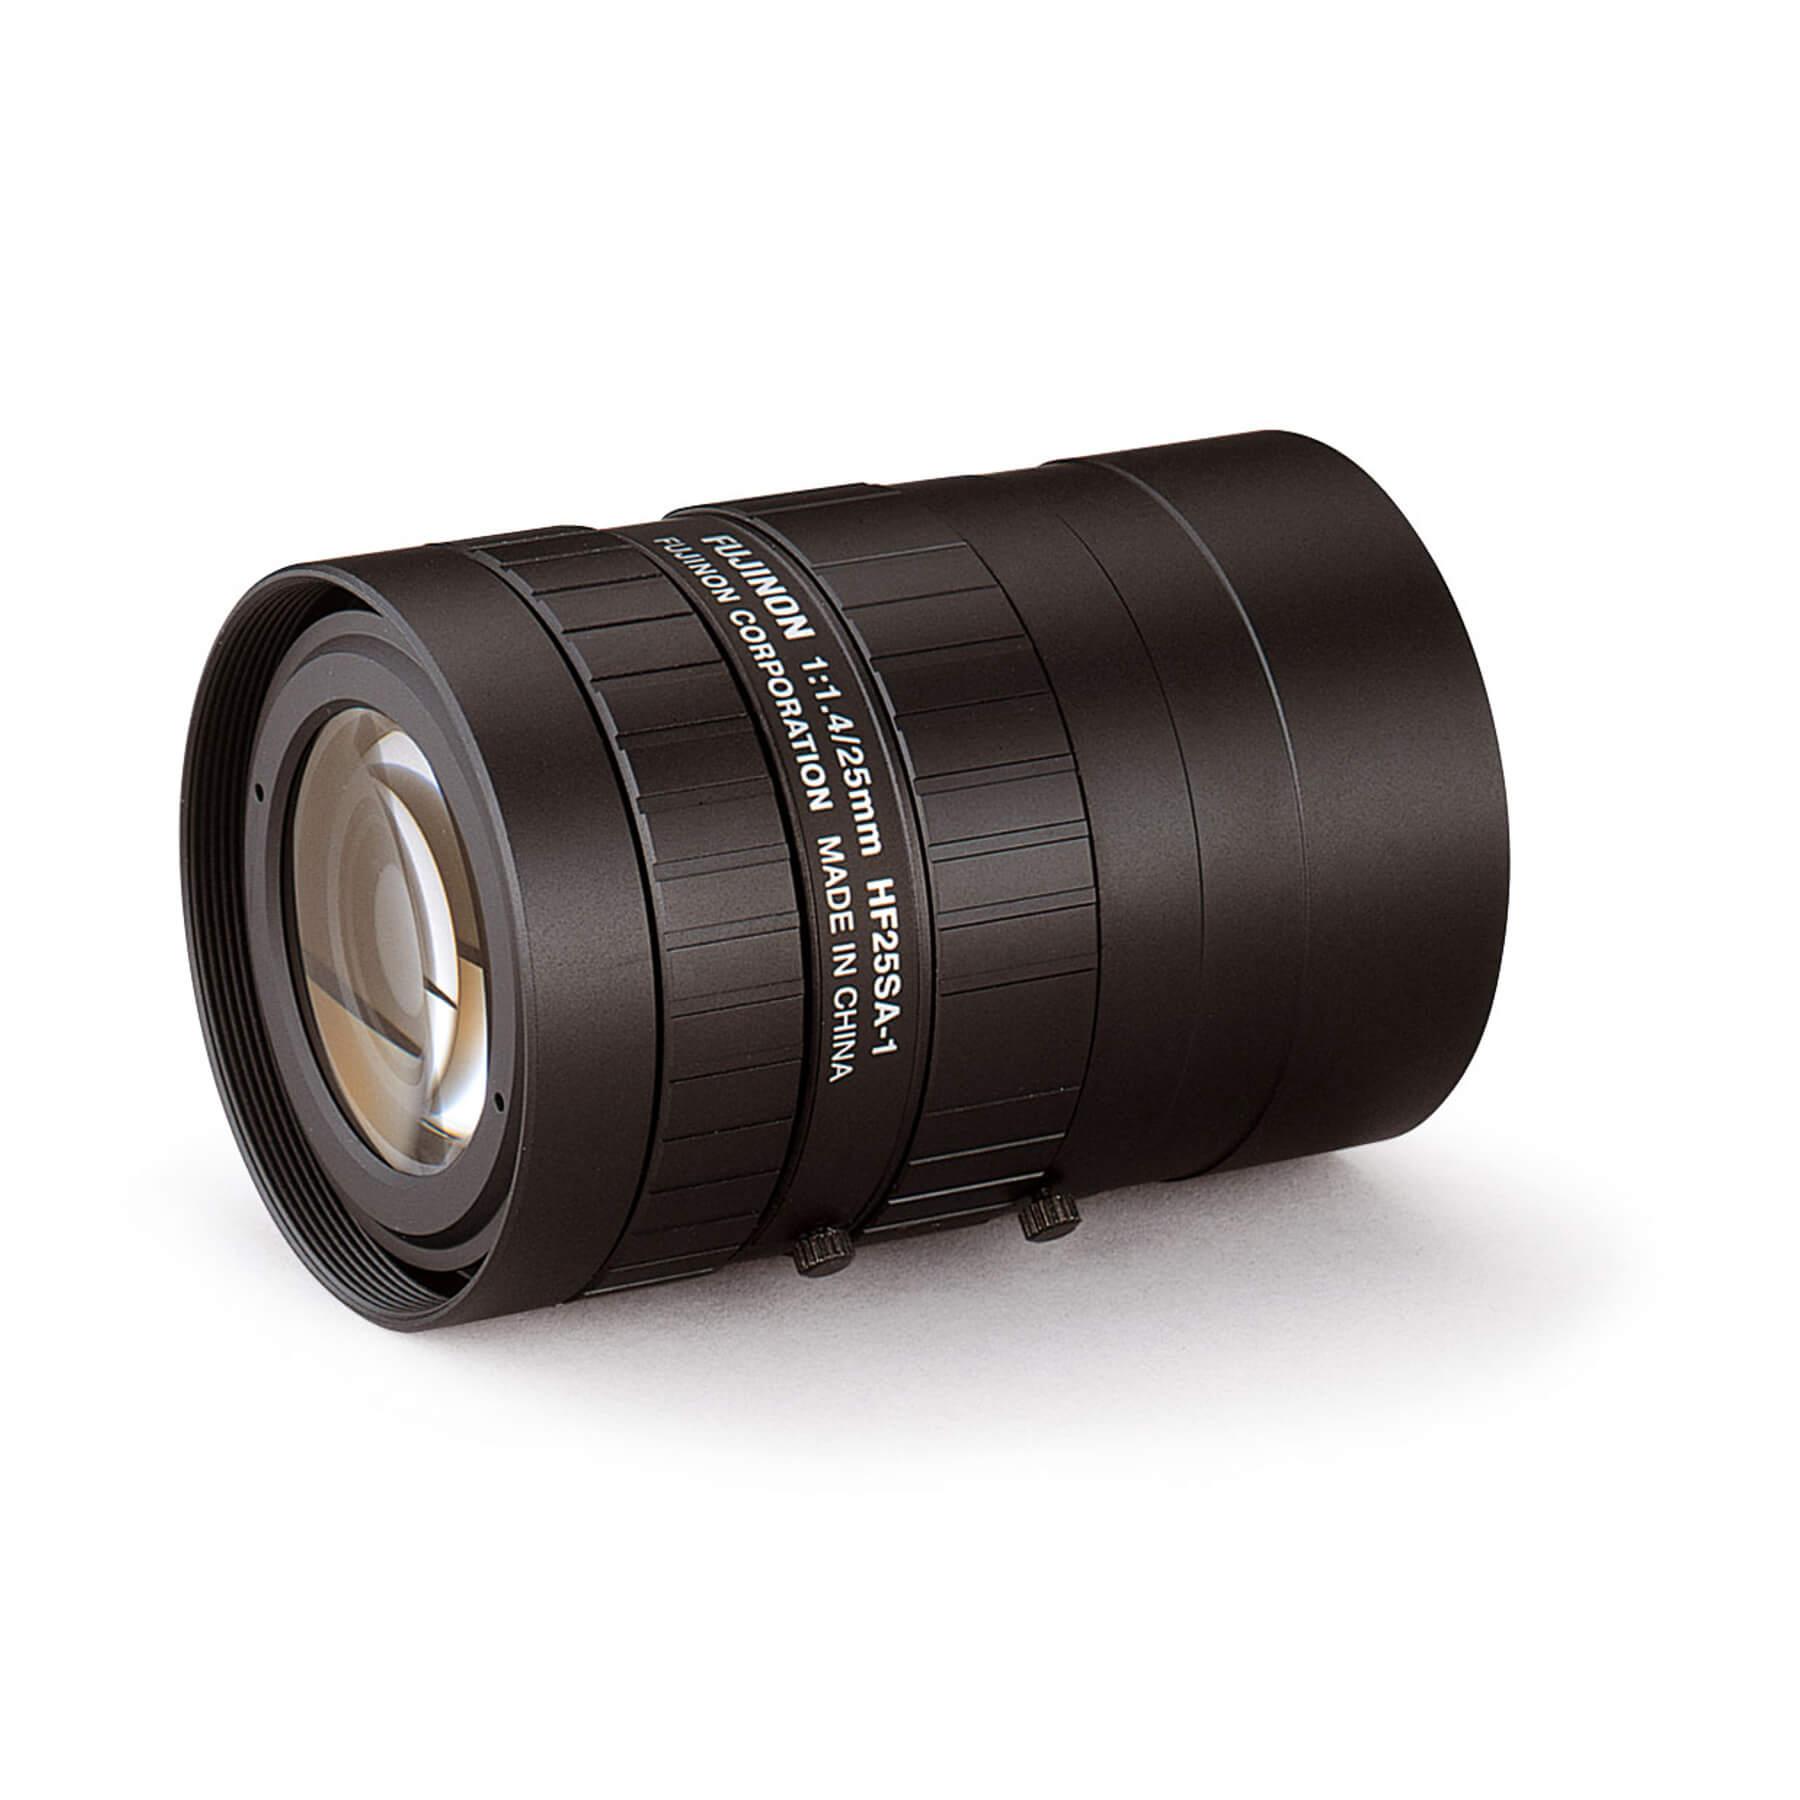 5 Megapixel HF25SA